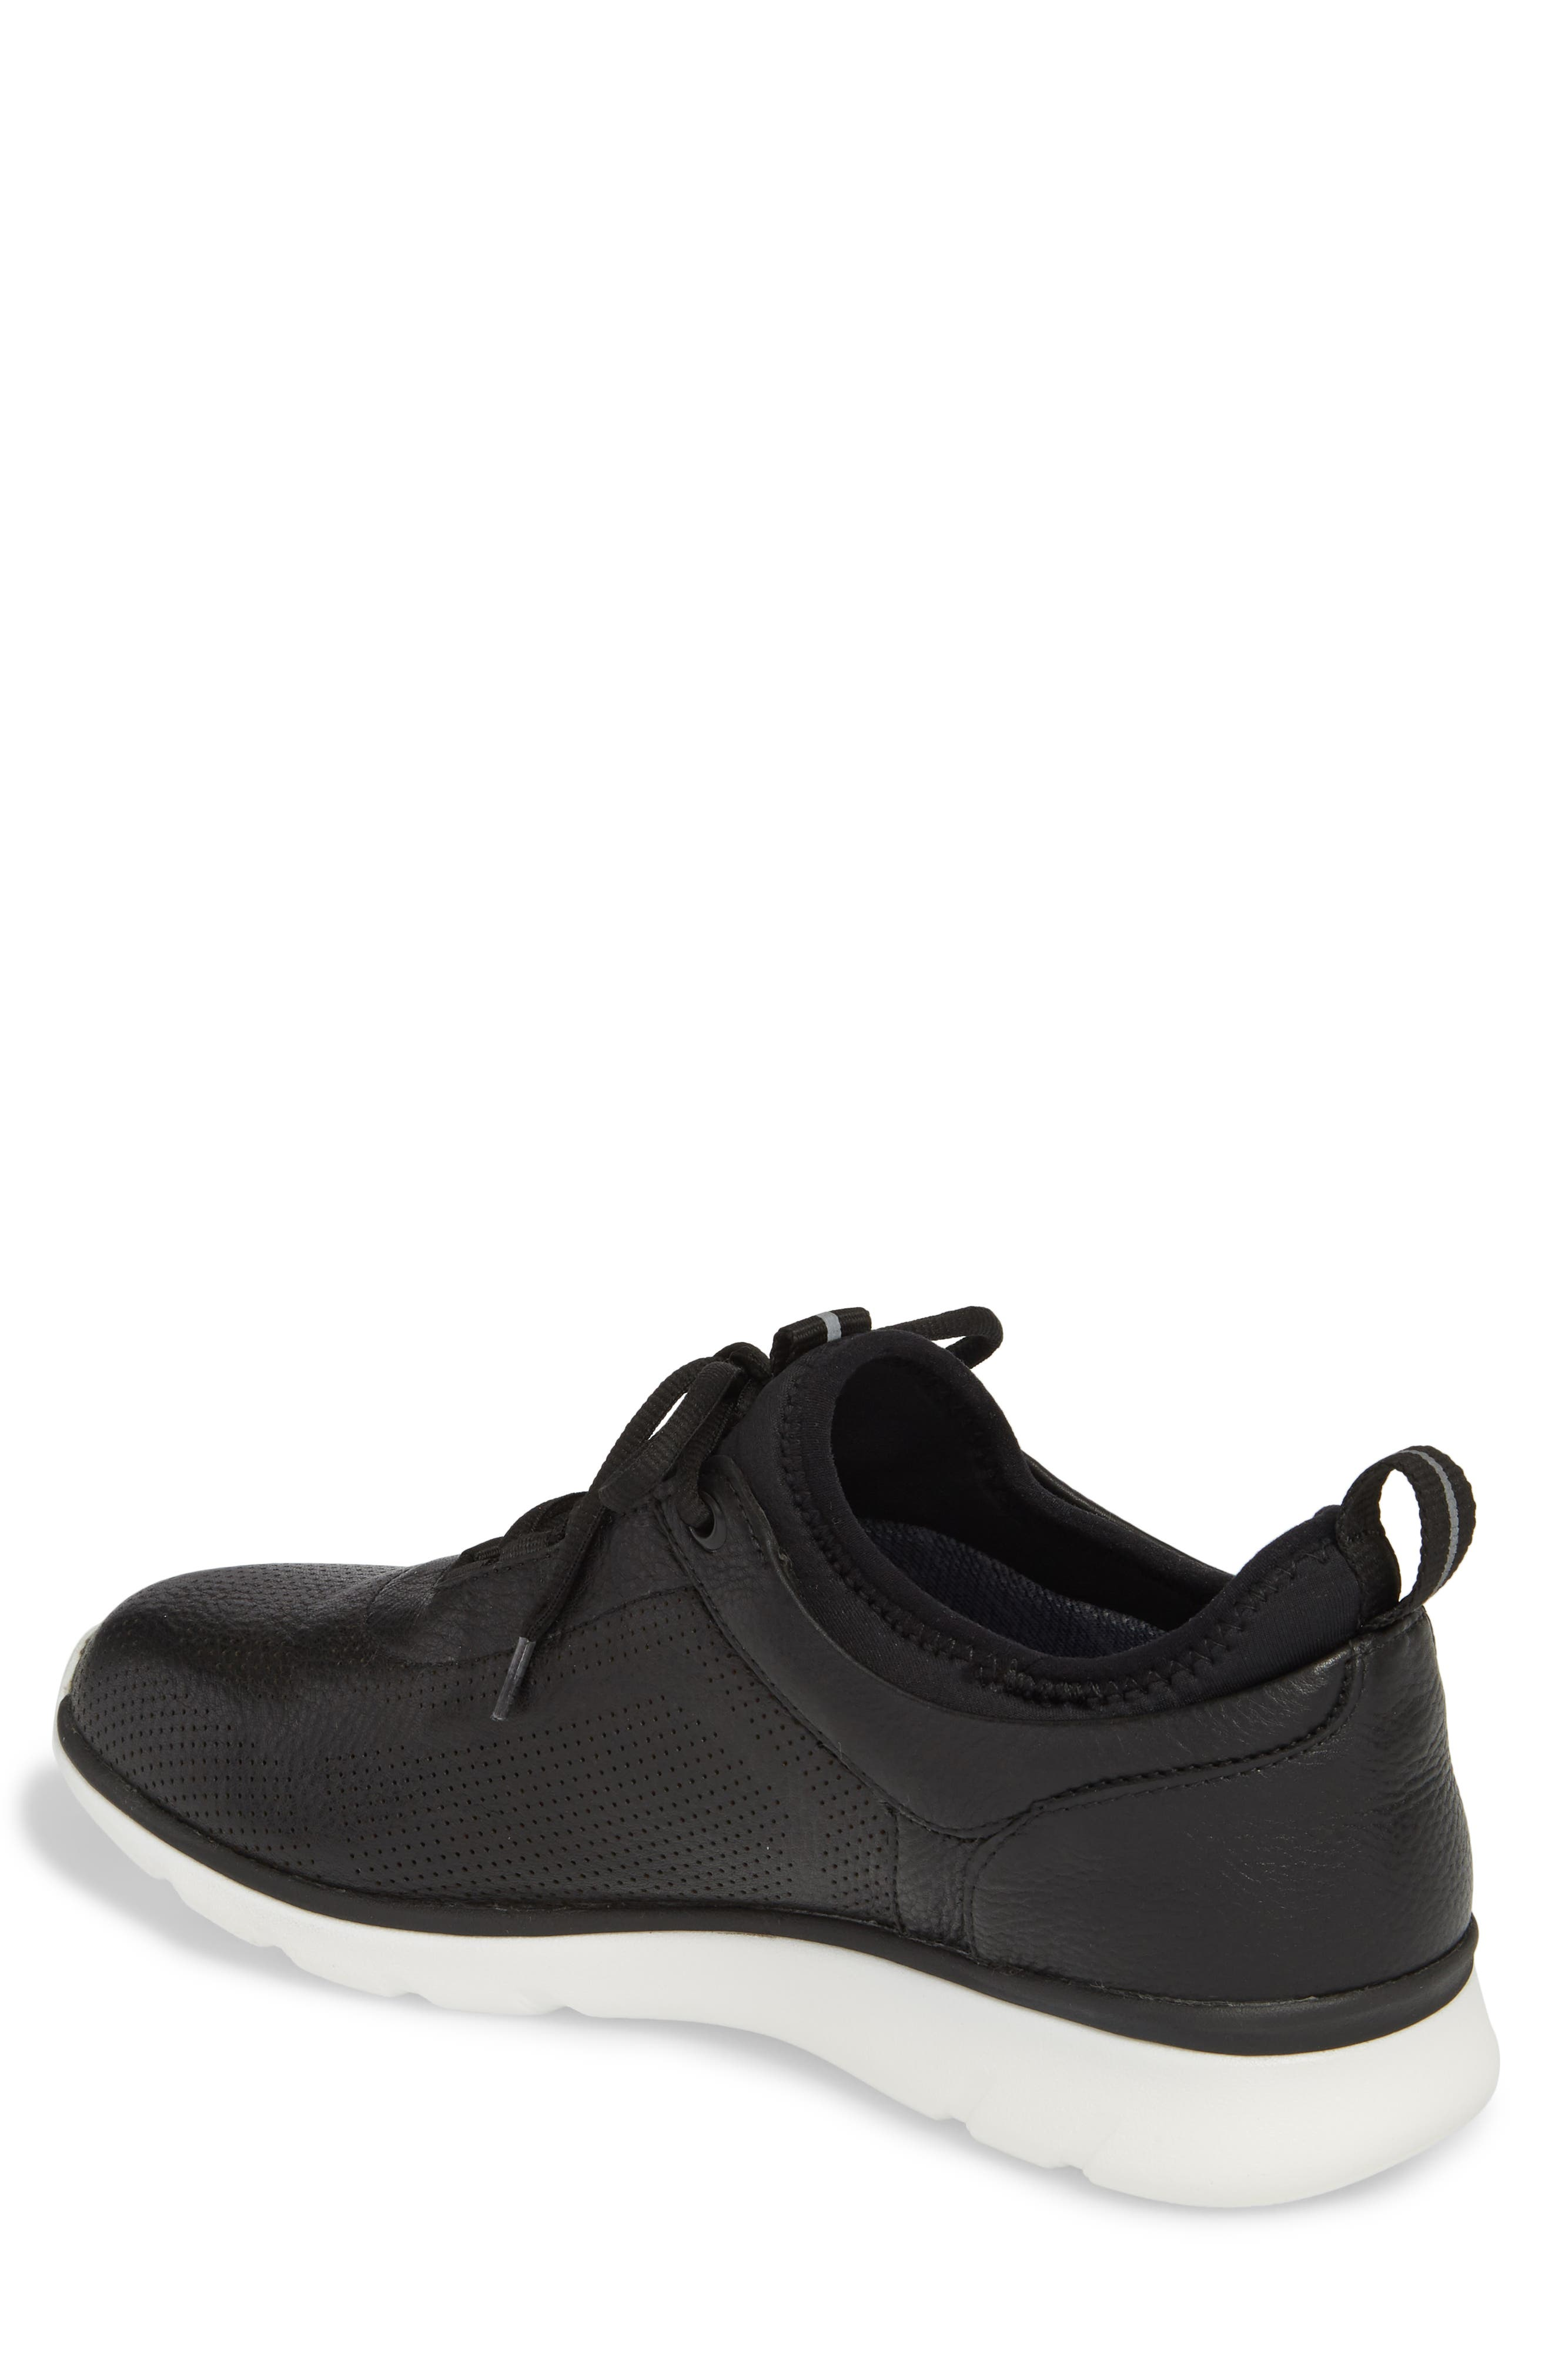 Prentiss XC4<sup>®</sup> Waterproof Sneaker,                             Alternate thumbnail 2, color,                             BLACK LEATHER